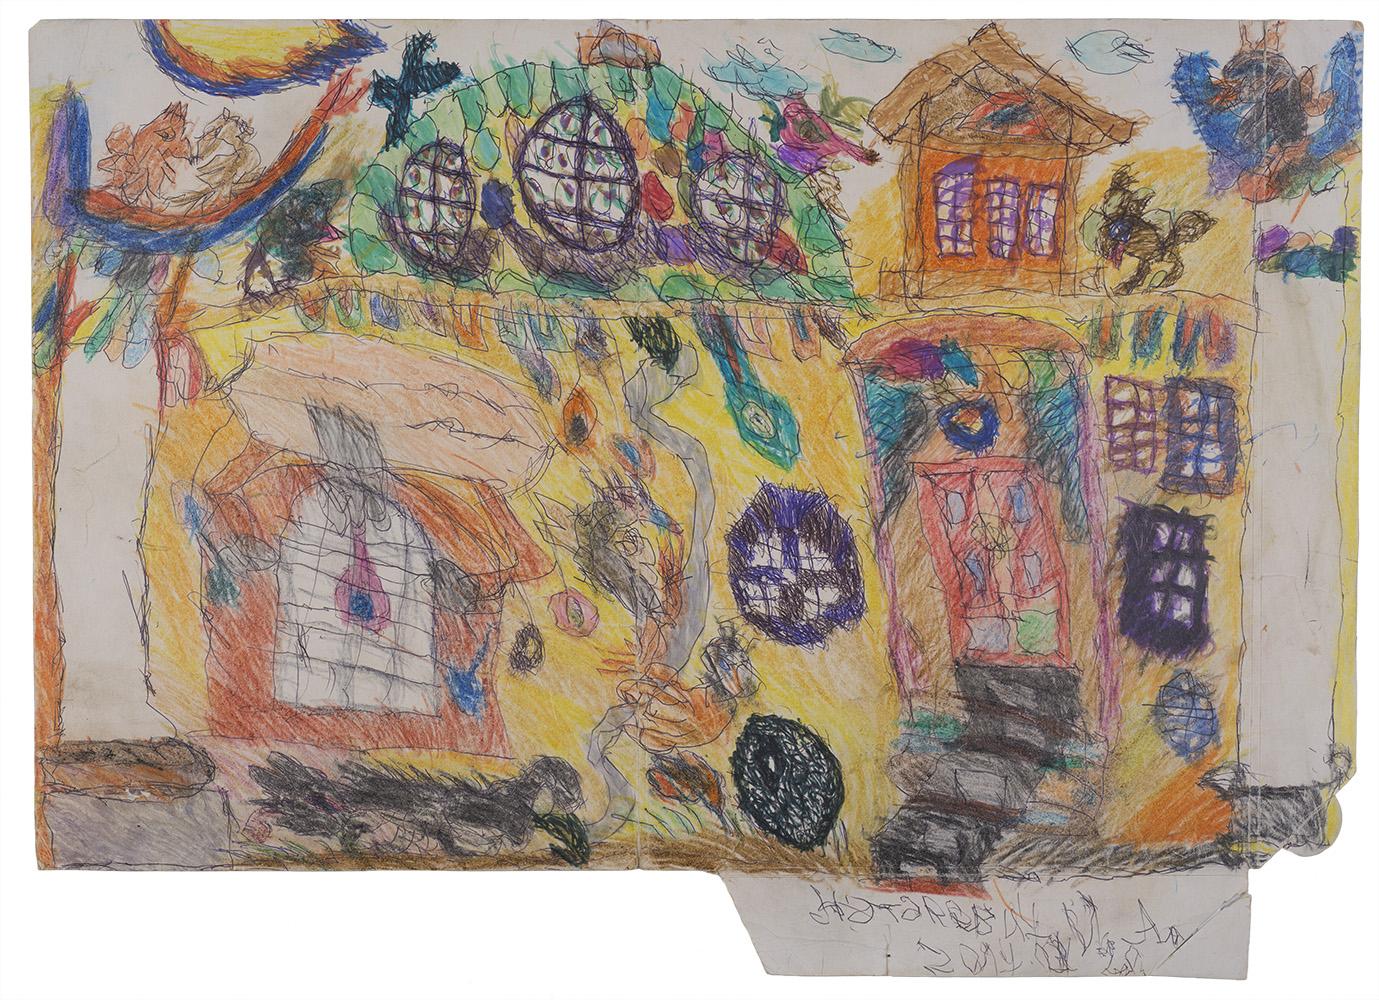 Ilya Natarevich    Church of St. Catherine  , 2015 Ink, graphite, crayon on cardboard 19 x 26.5 inches 48.3 x 67.3 cm INa 11